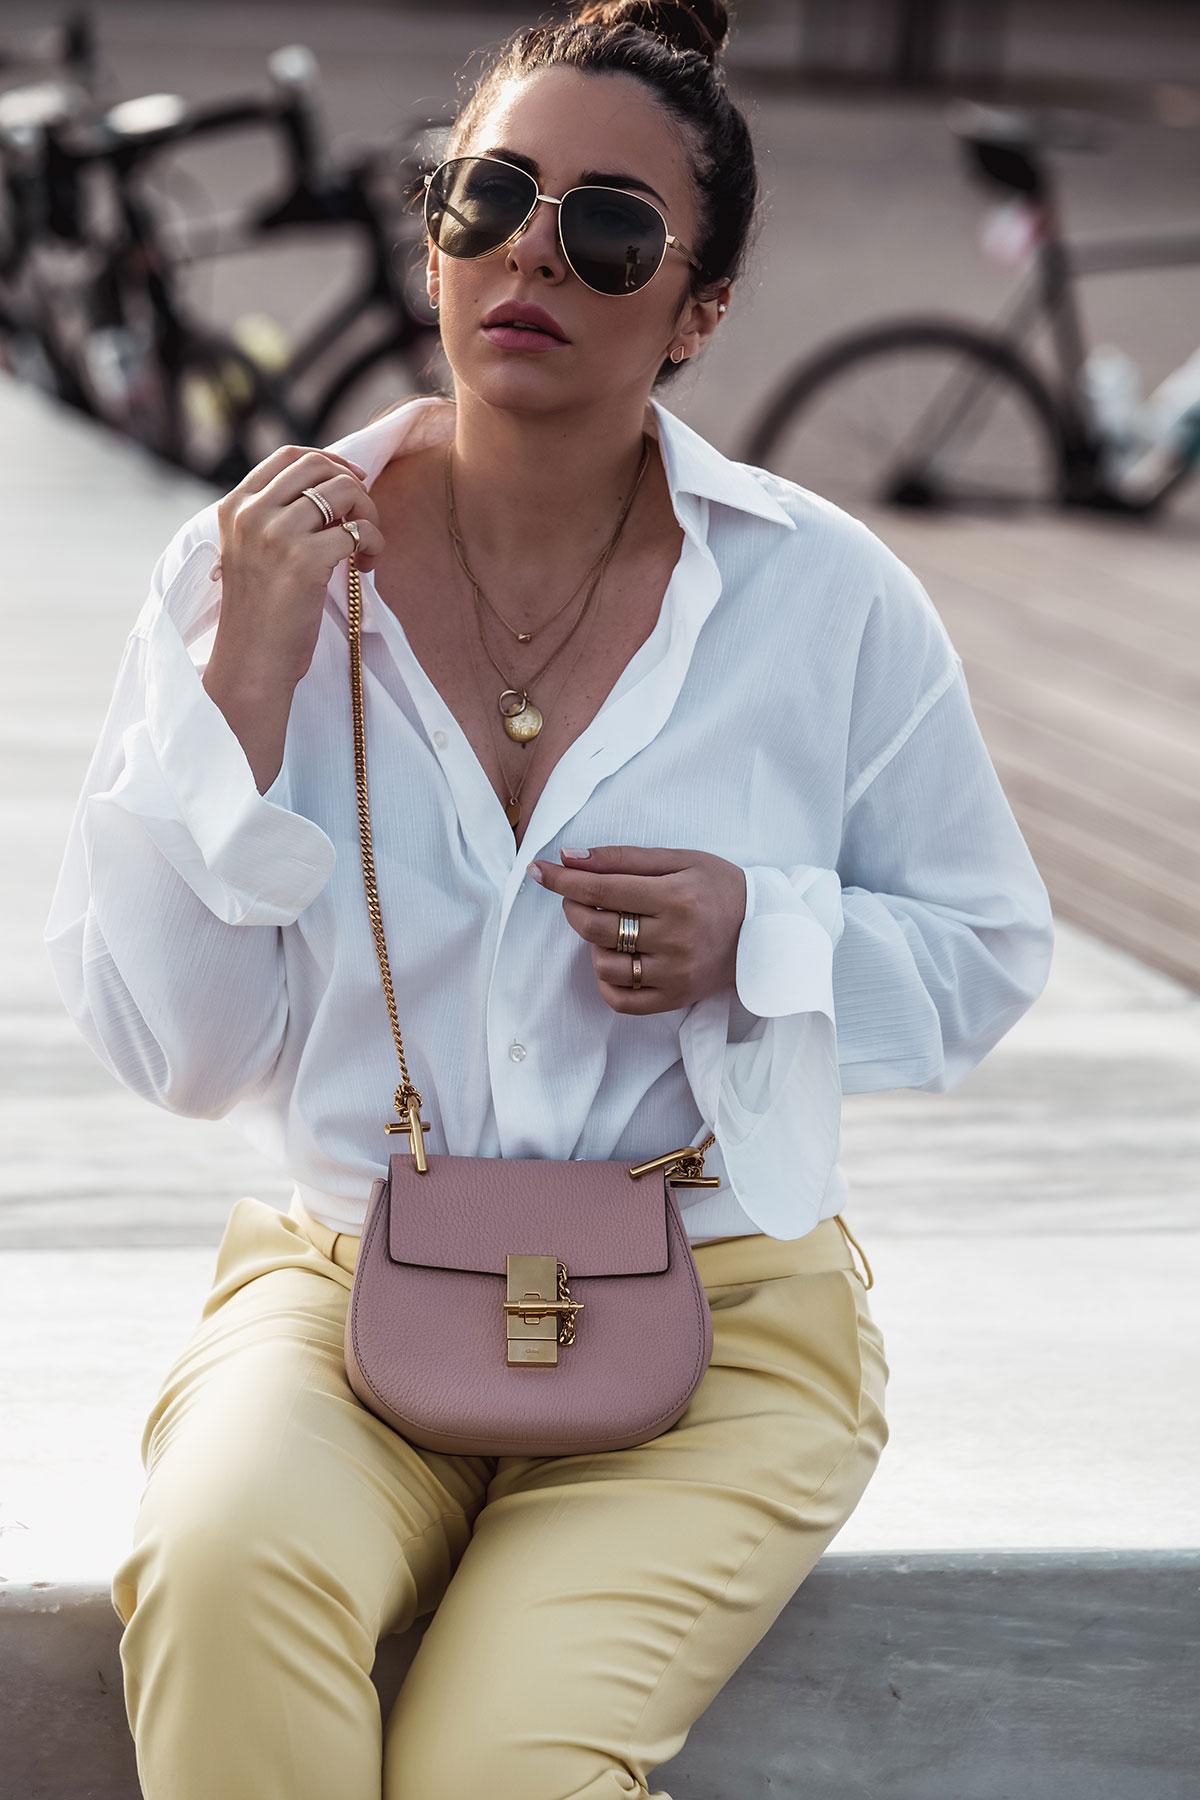 nursing nursing outfit idea - Stella Asteria wearing men's shirt, yellow pants, Chloé Drew in cement pink idea - Stella Asteria wearing men's shirt, yellow pants, Chloé Drew in cement pink and Gucci men's sunglasses